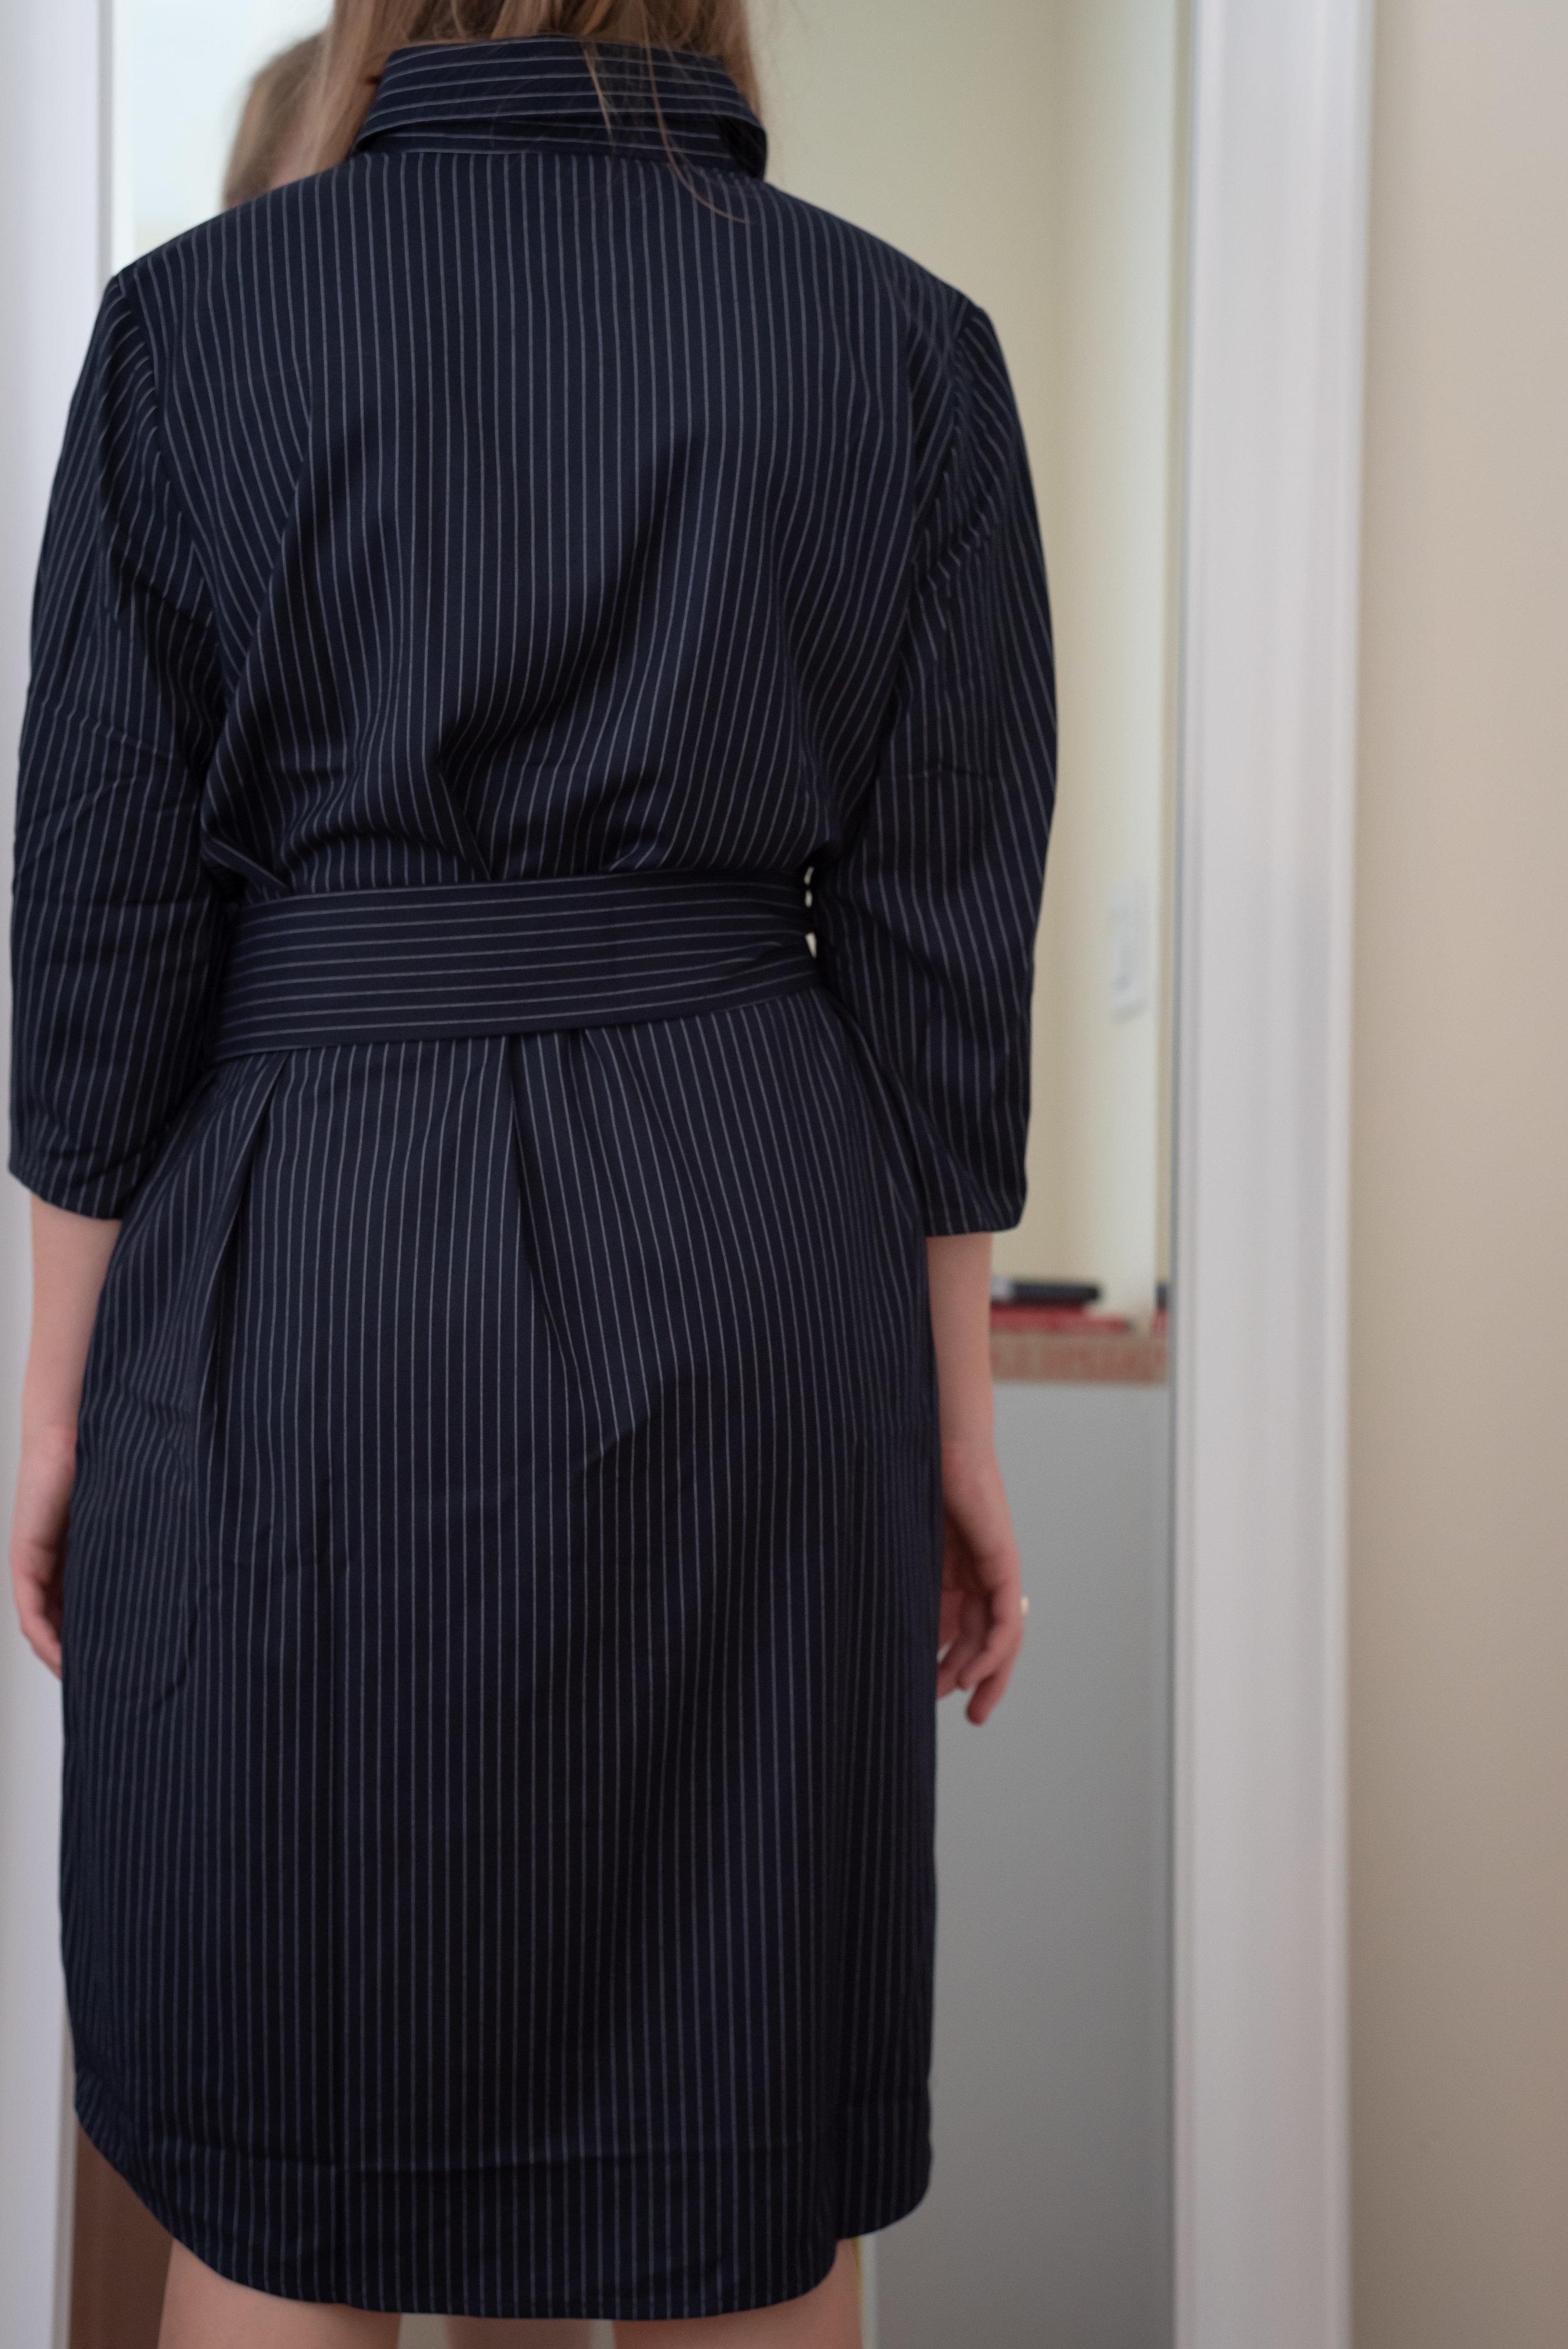 Petite Studio Rococo Dress - Size Petite M - BACK